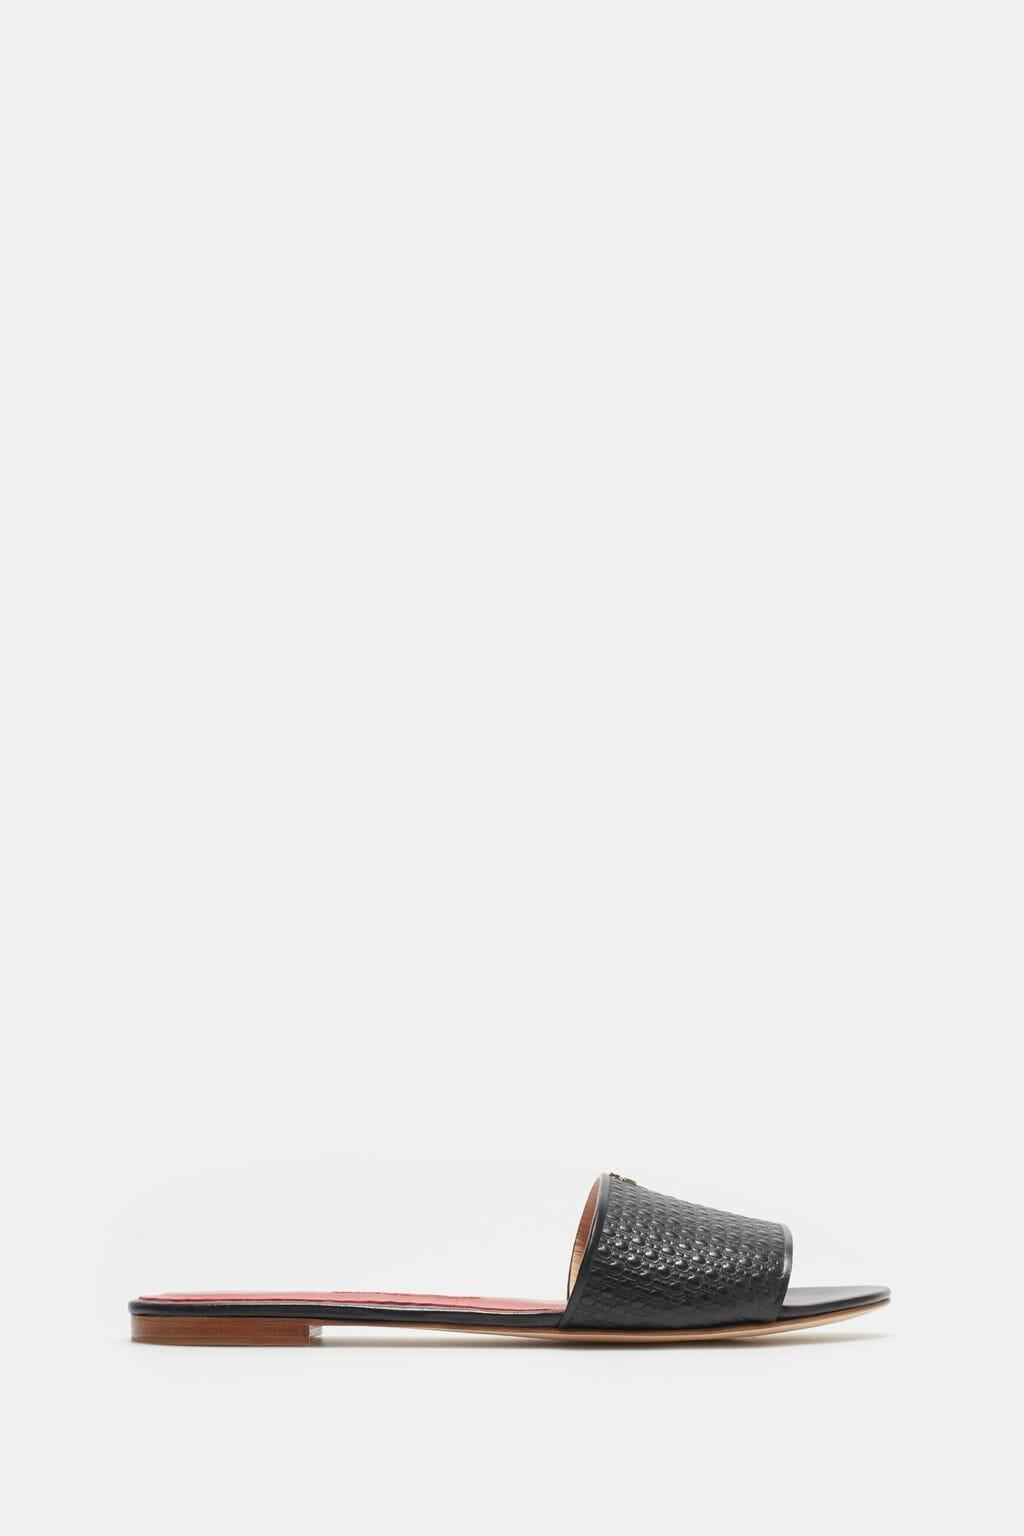 CH-Carolina-herrera-shoes-collection-Spring-Summer-2018-shoe-44